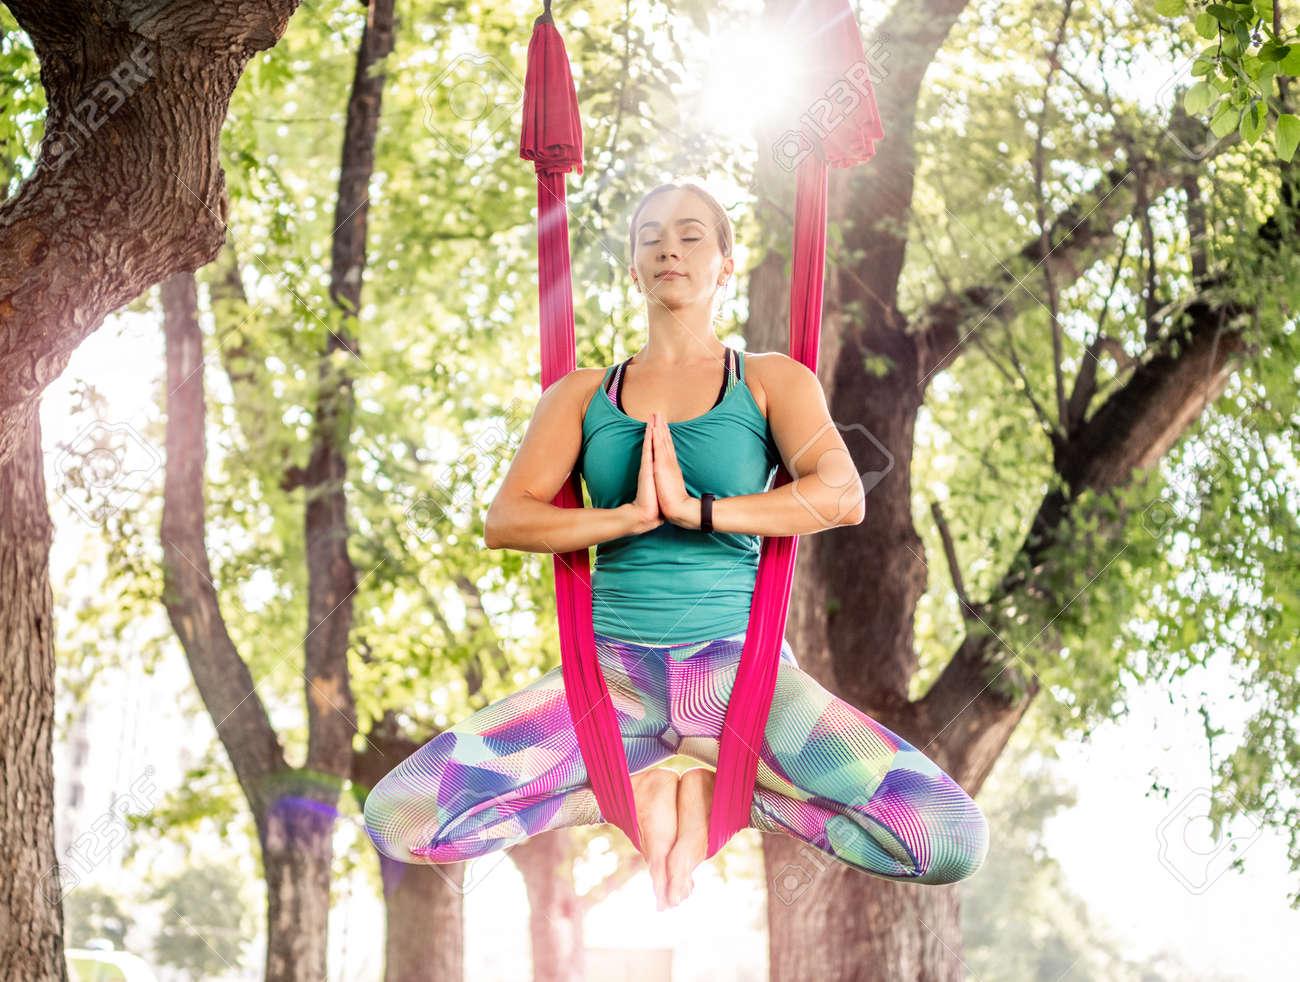 Girl doing fly yoga - 172489945